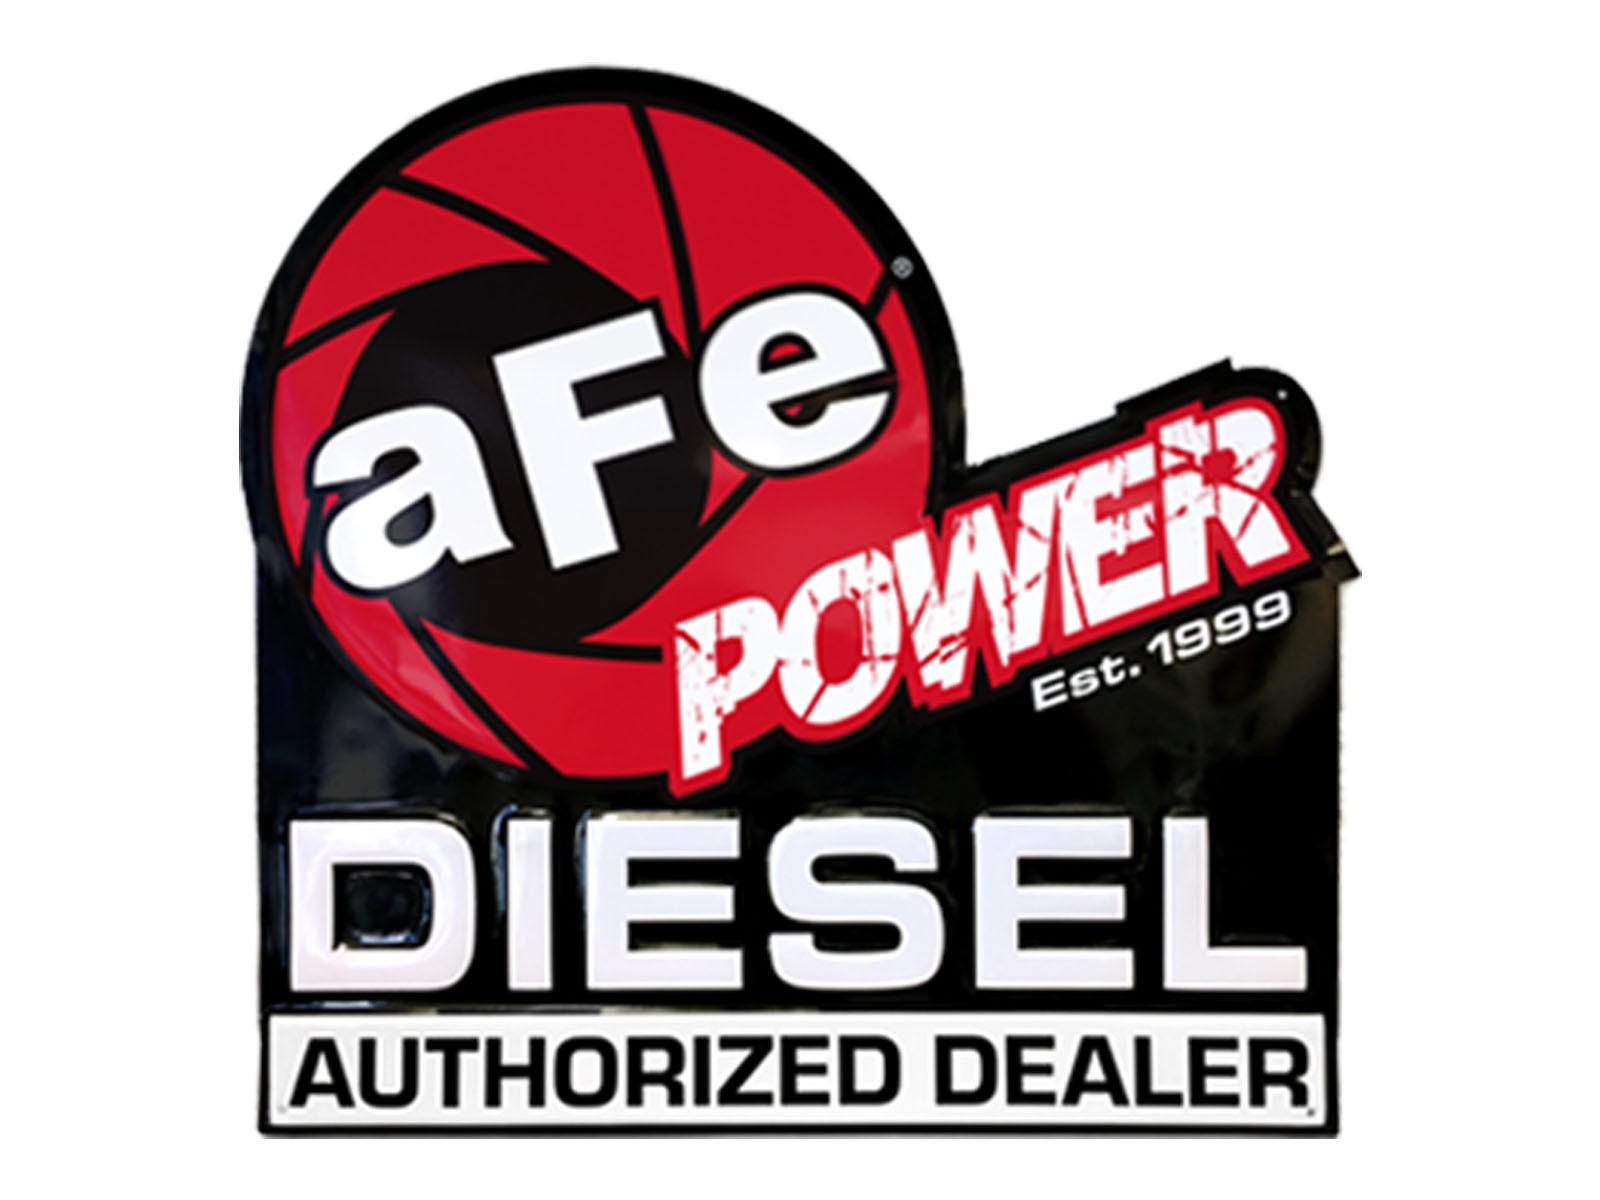 aFe POWER 40-10193 aFe POWER Authorized Dealer Sign